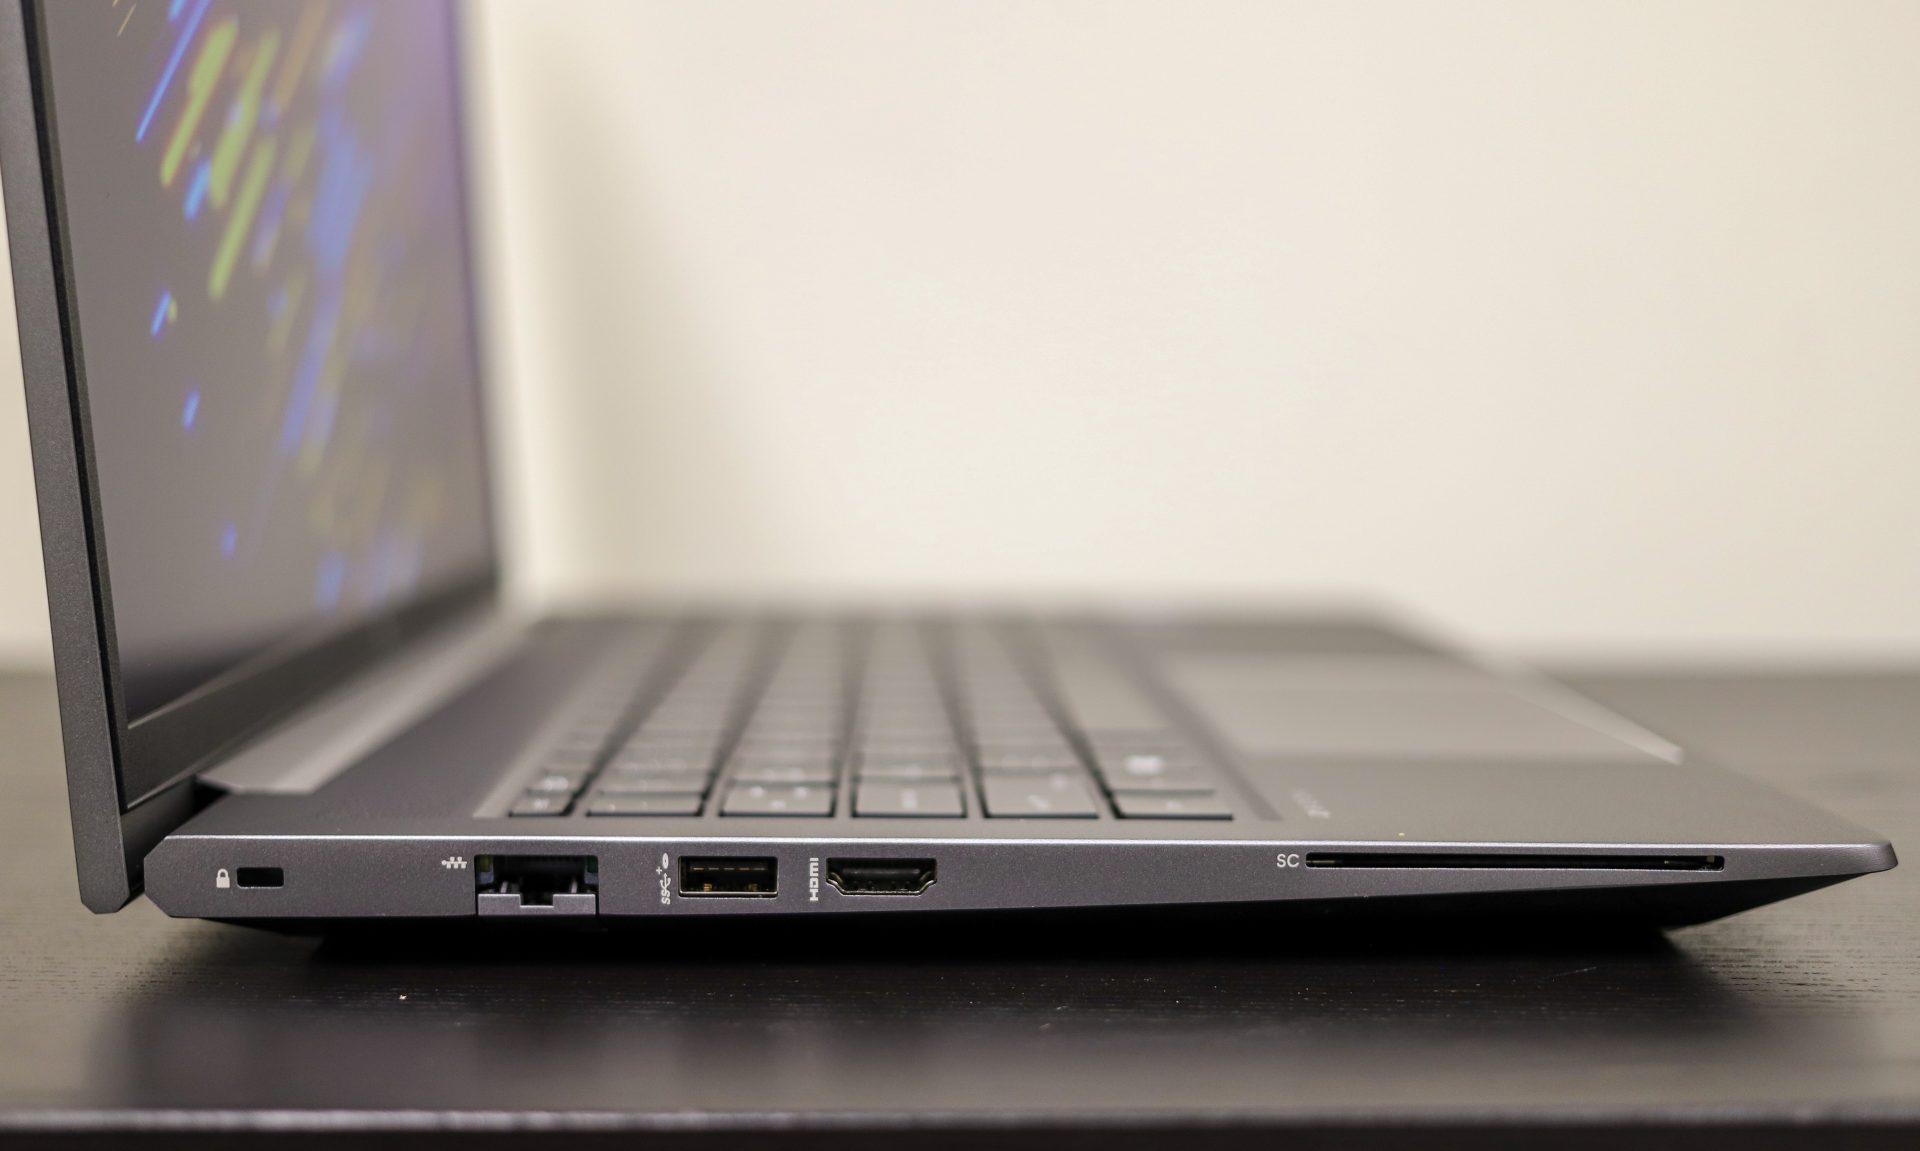 HP ZBook Power G8 ports